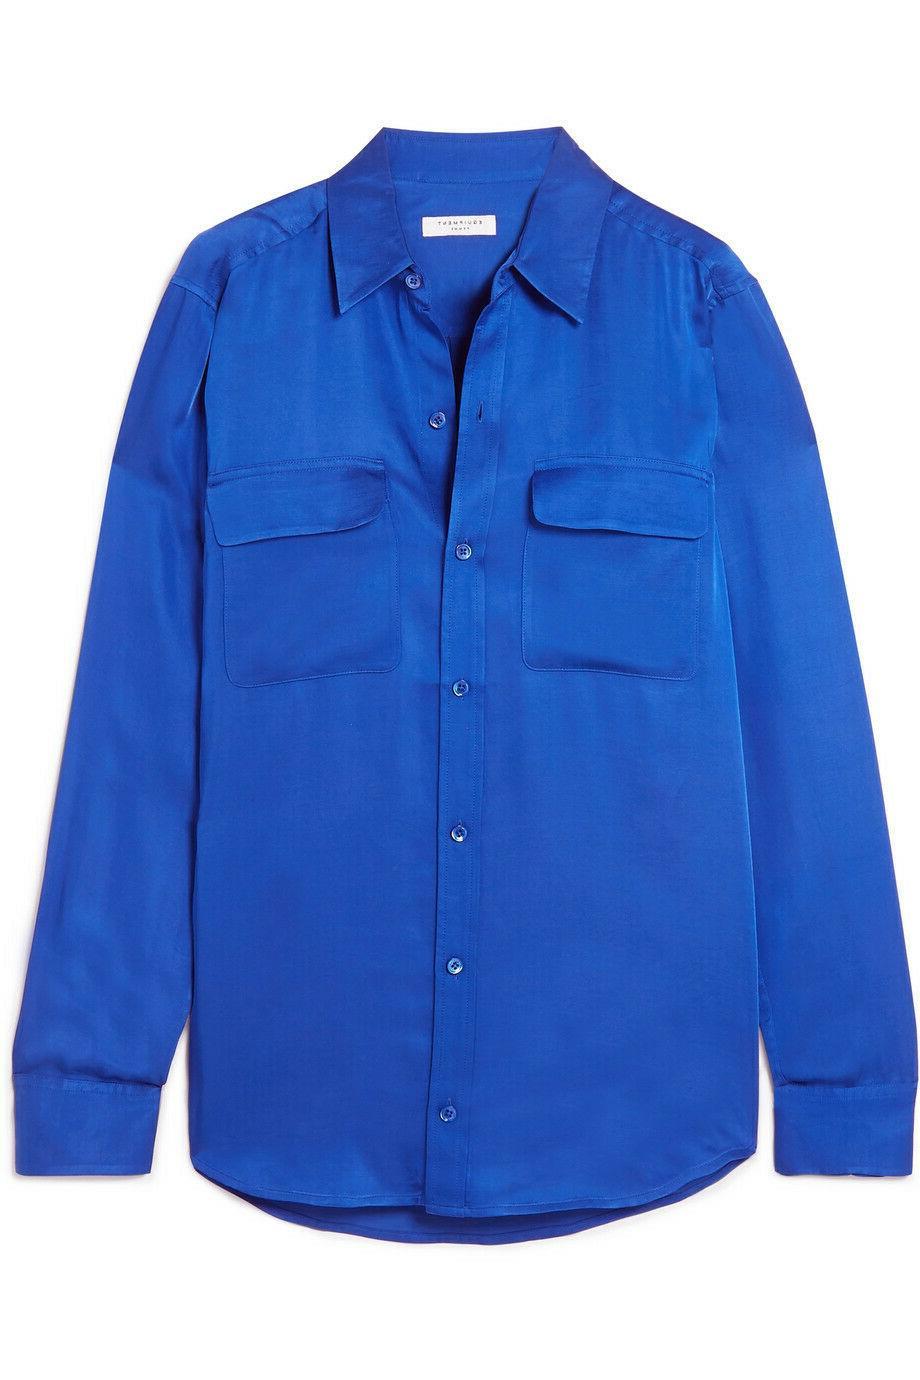 NWOT $230 Blue Satin S